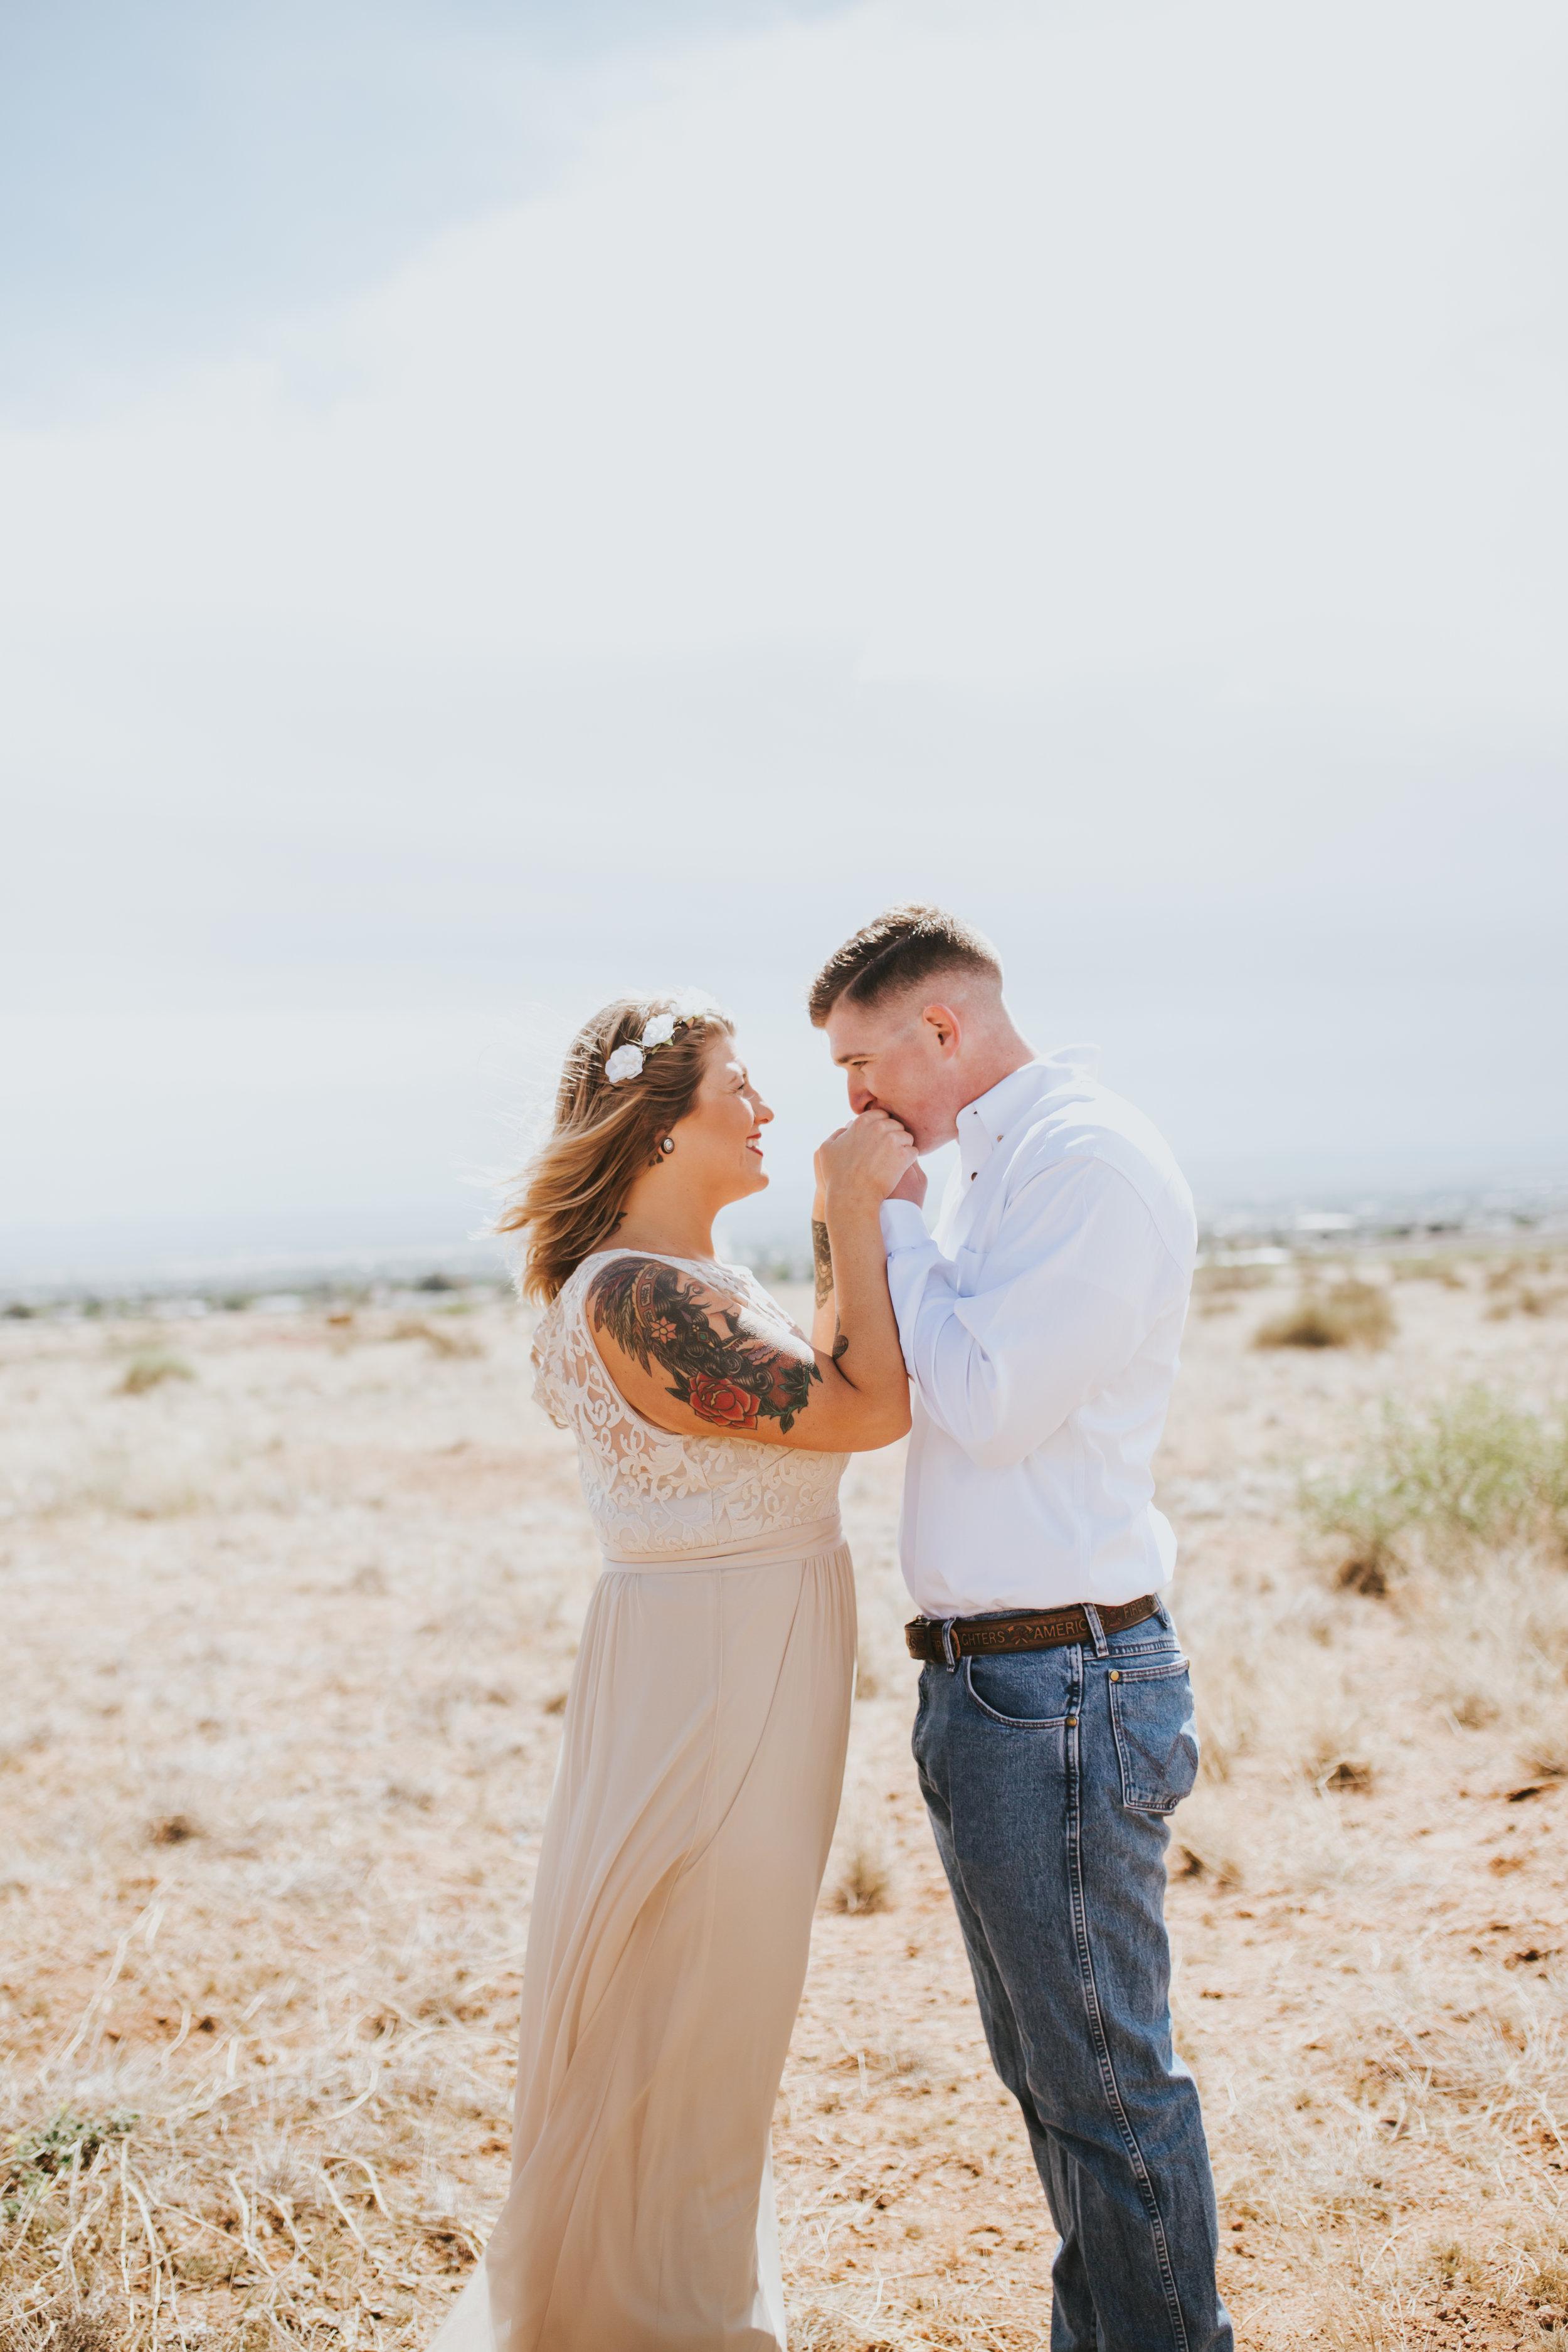 el-paso-texas-wedding-photographer-36